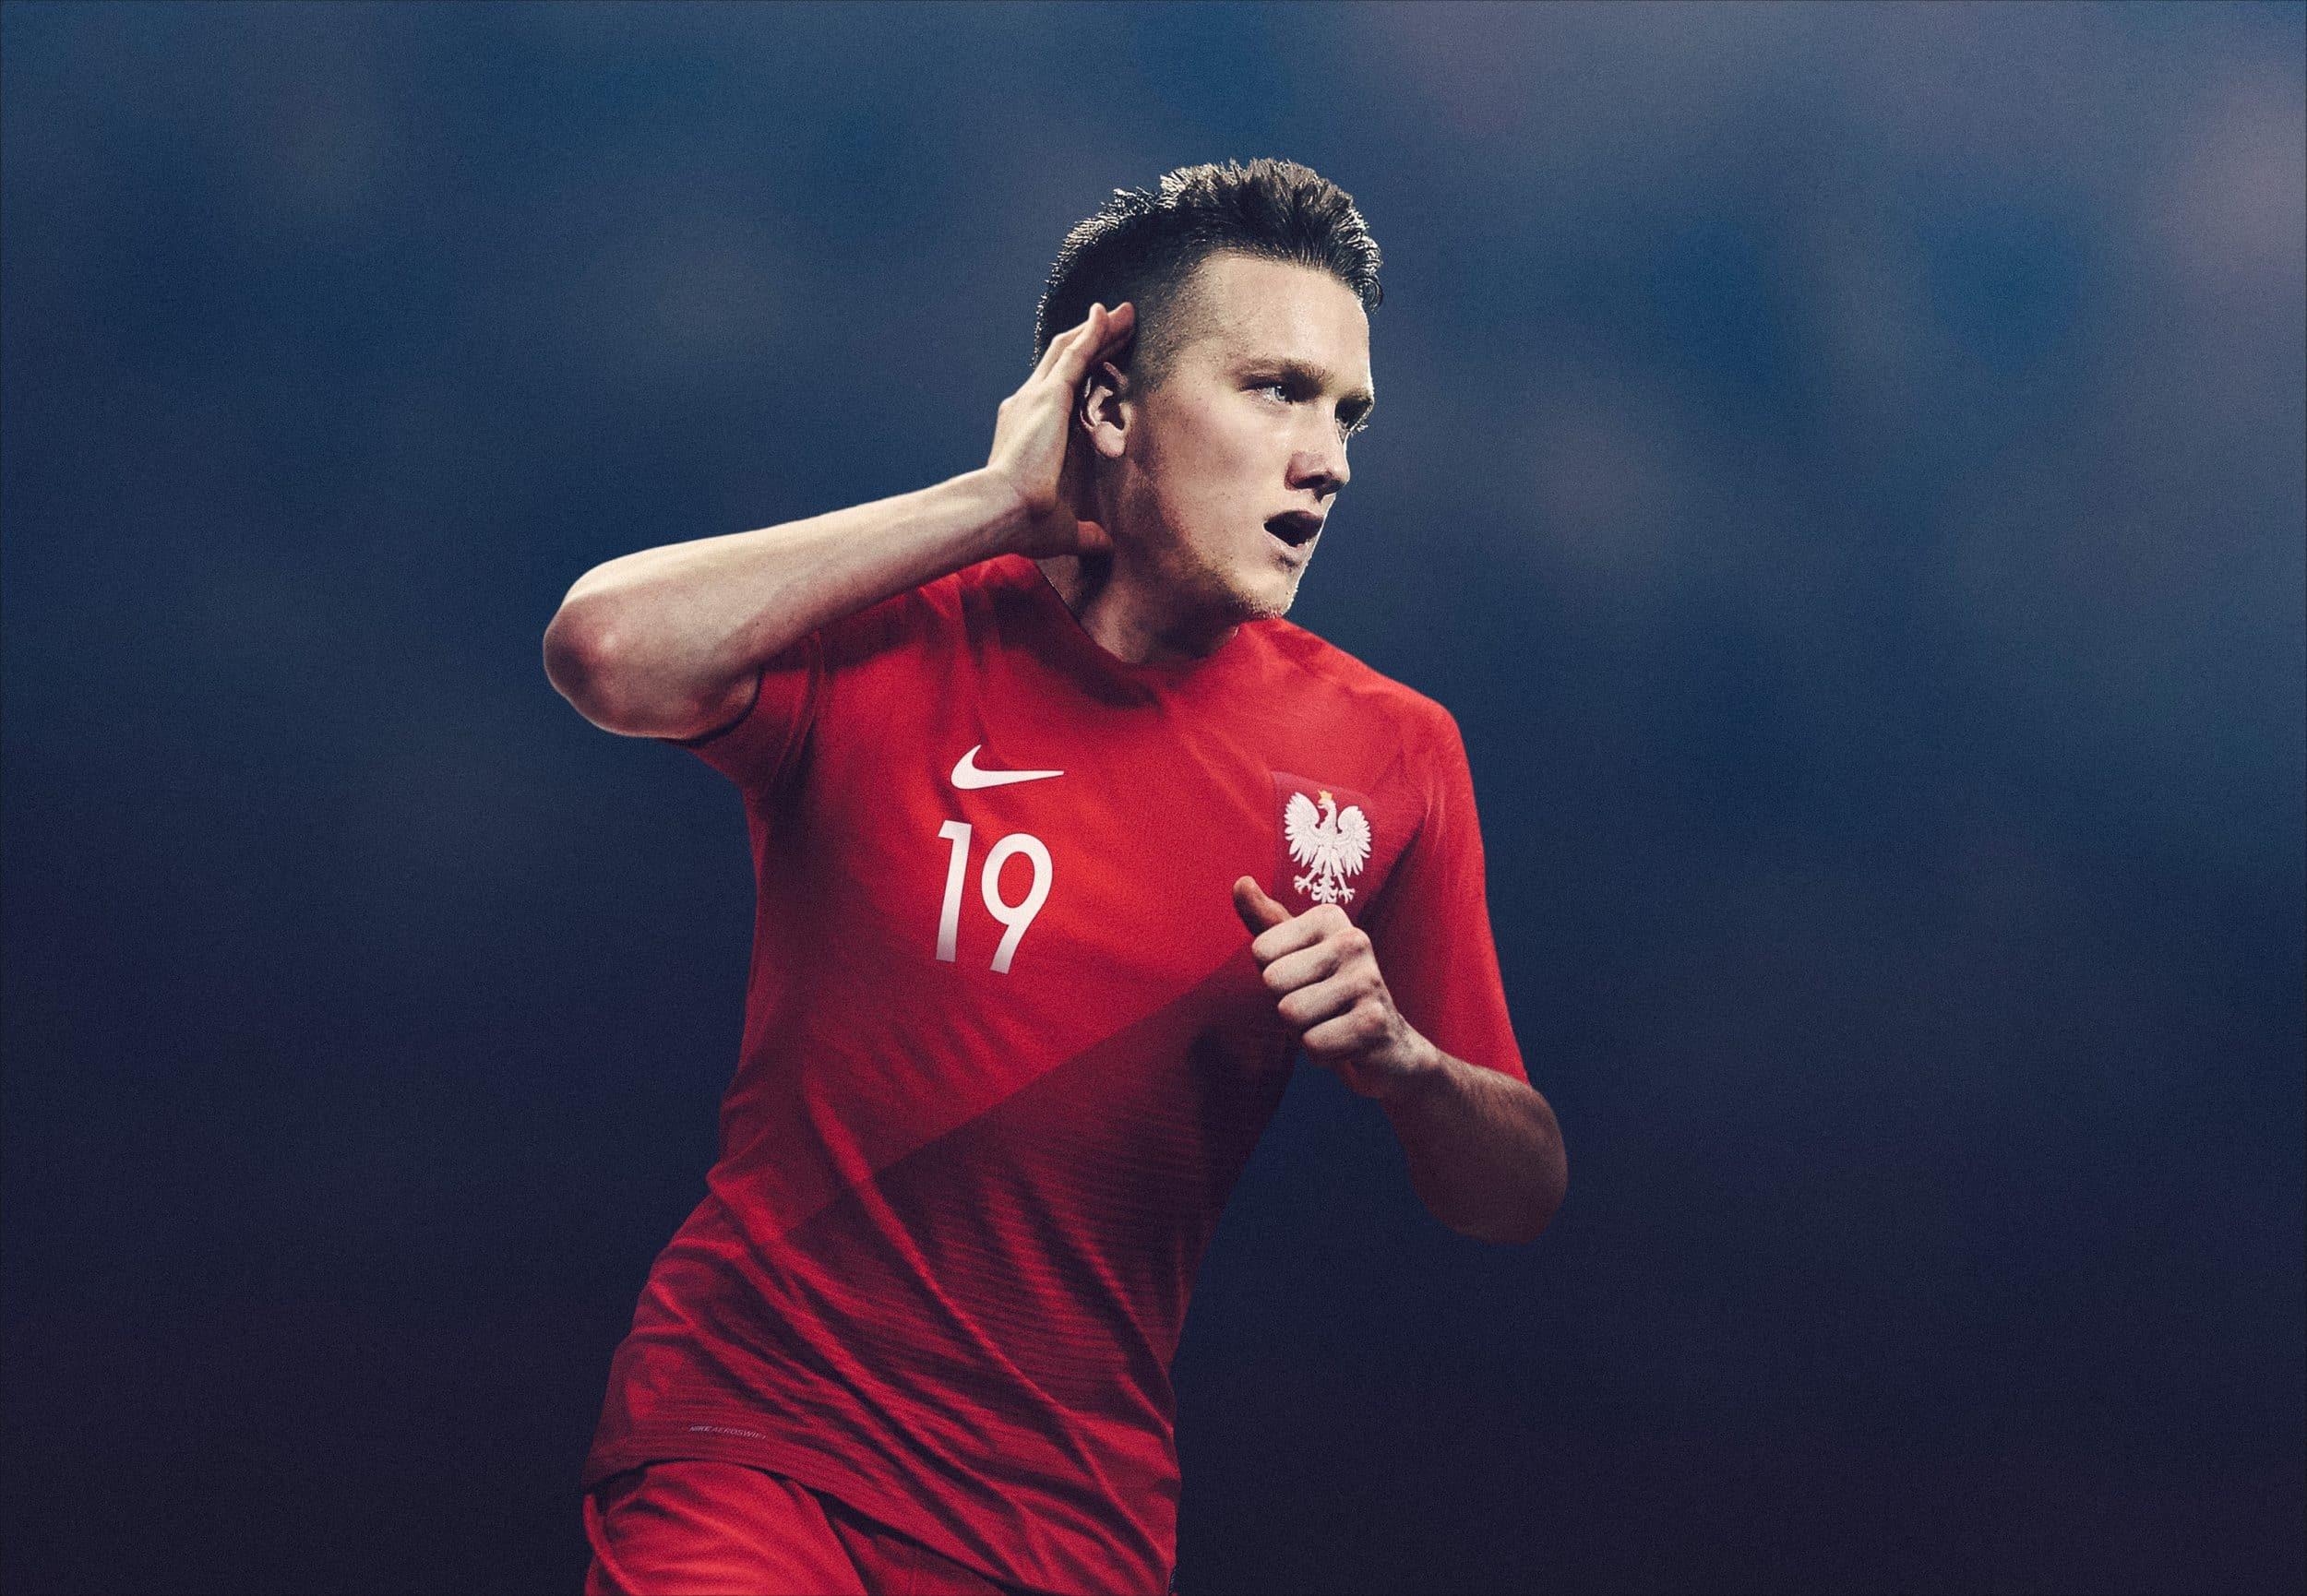 maillot-football-Nike-Pologne-exterieur-2018-img1.jpg